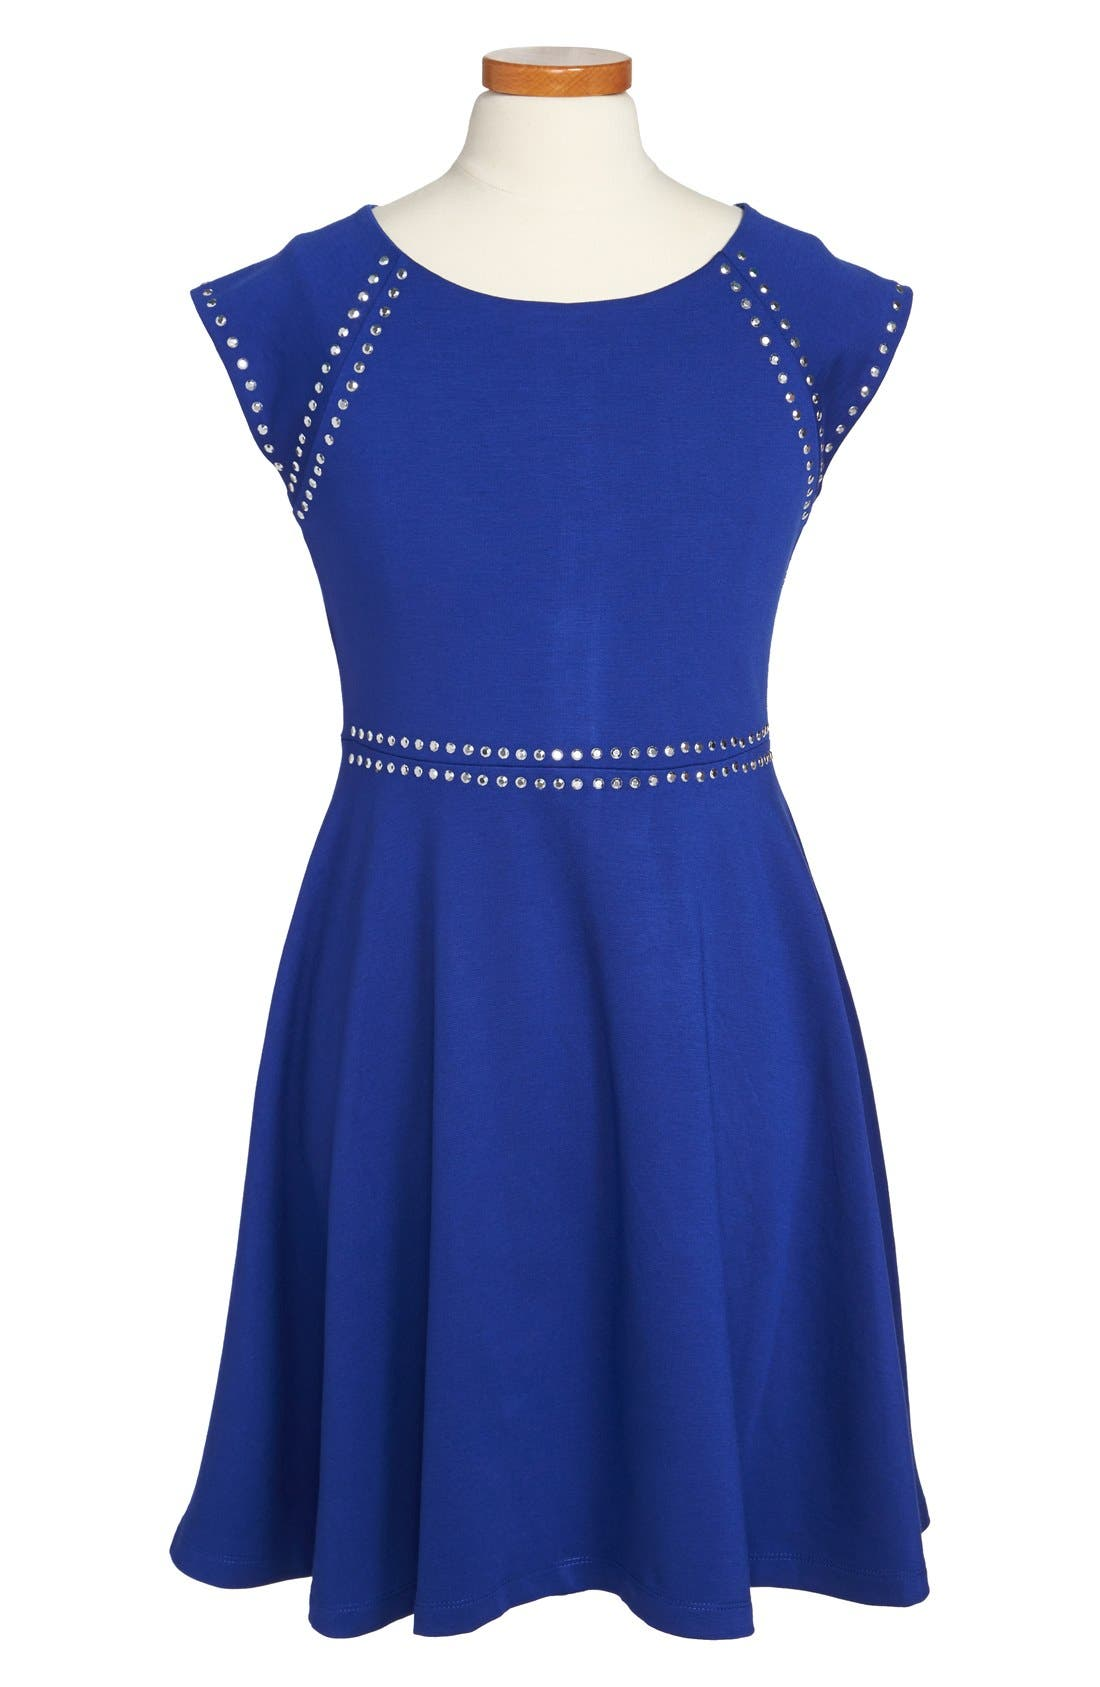 Main Image - Nicole Miller Studded Skater Dress (Big Girls)